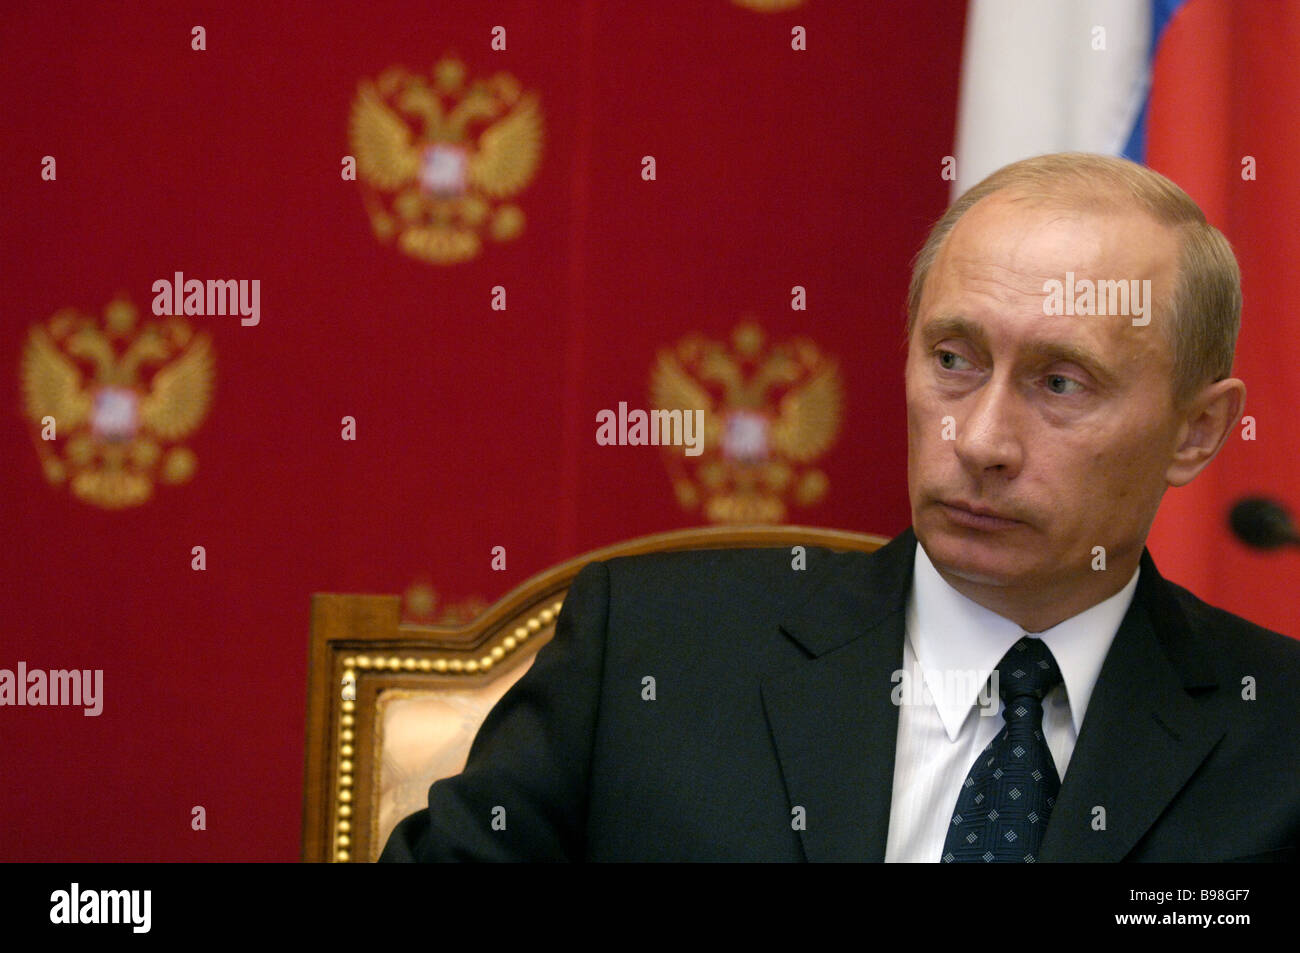 President of Russia Vladimir Putin in the Kremlin - Stock Image